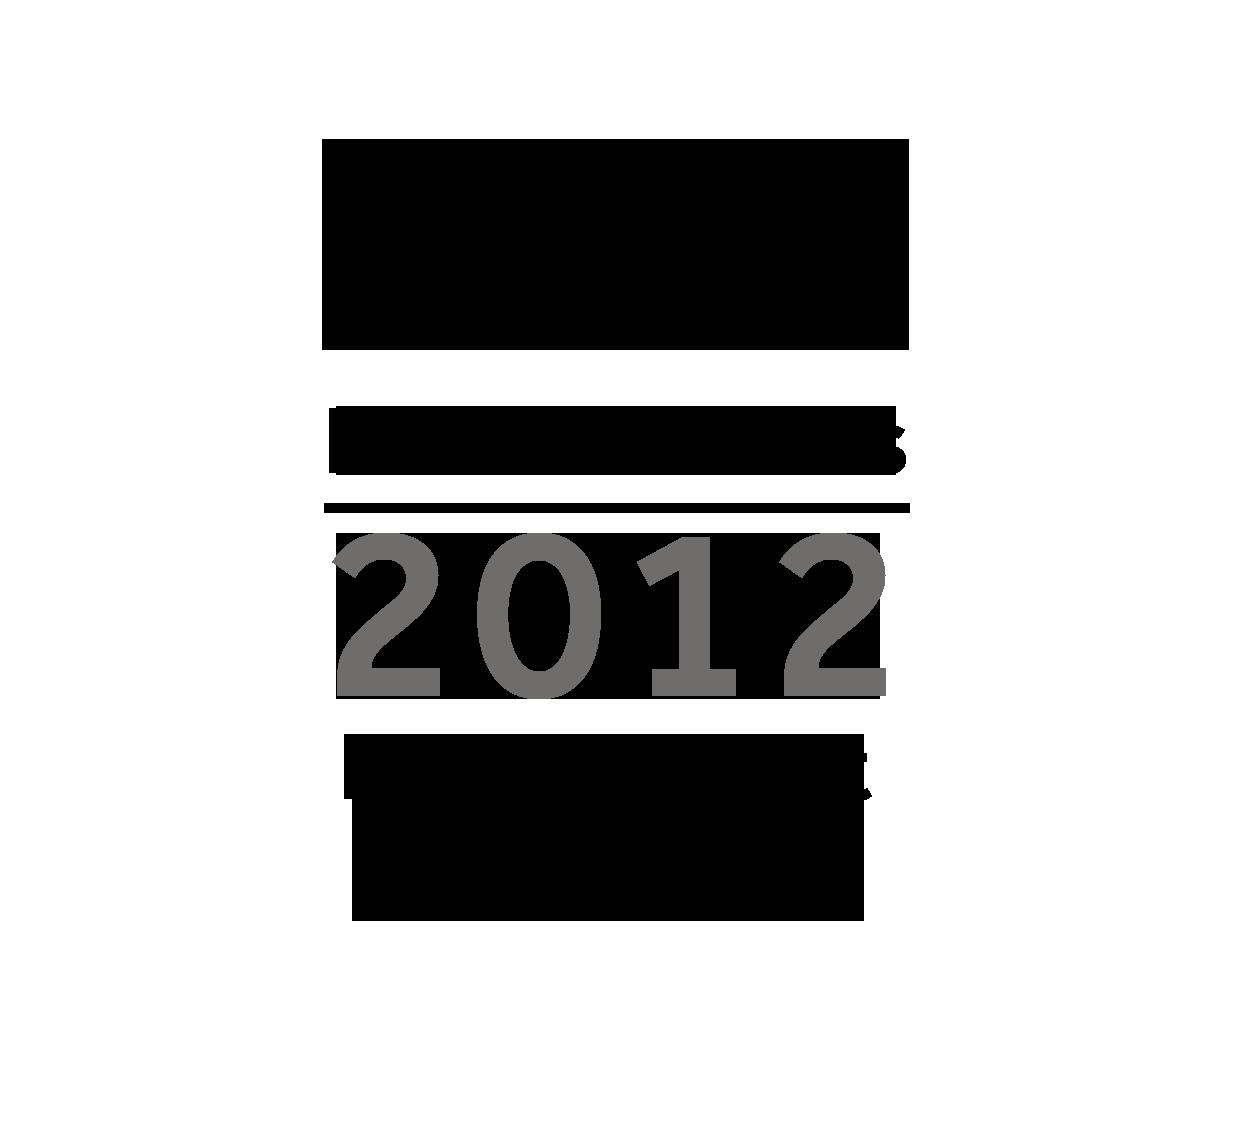 RICS2012.png